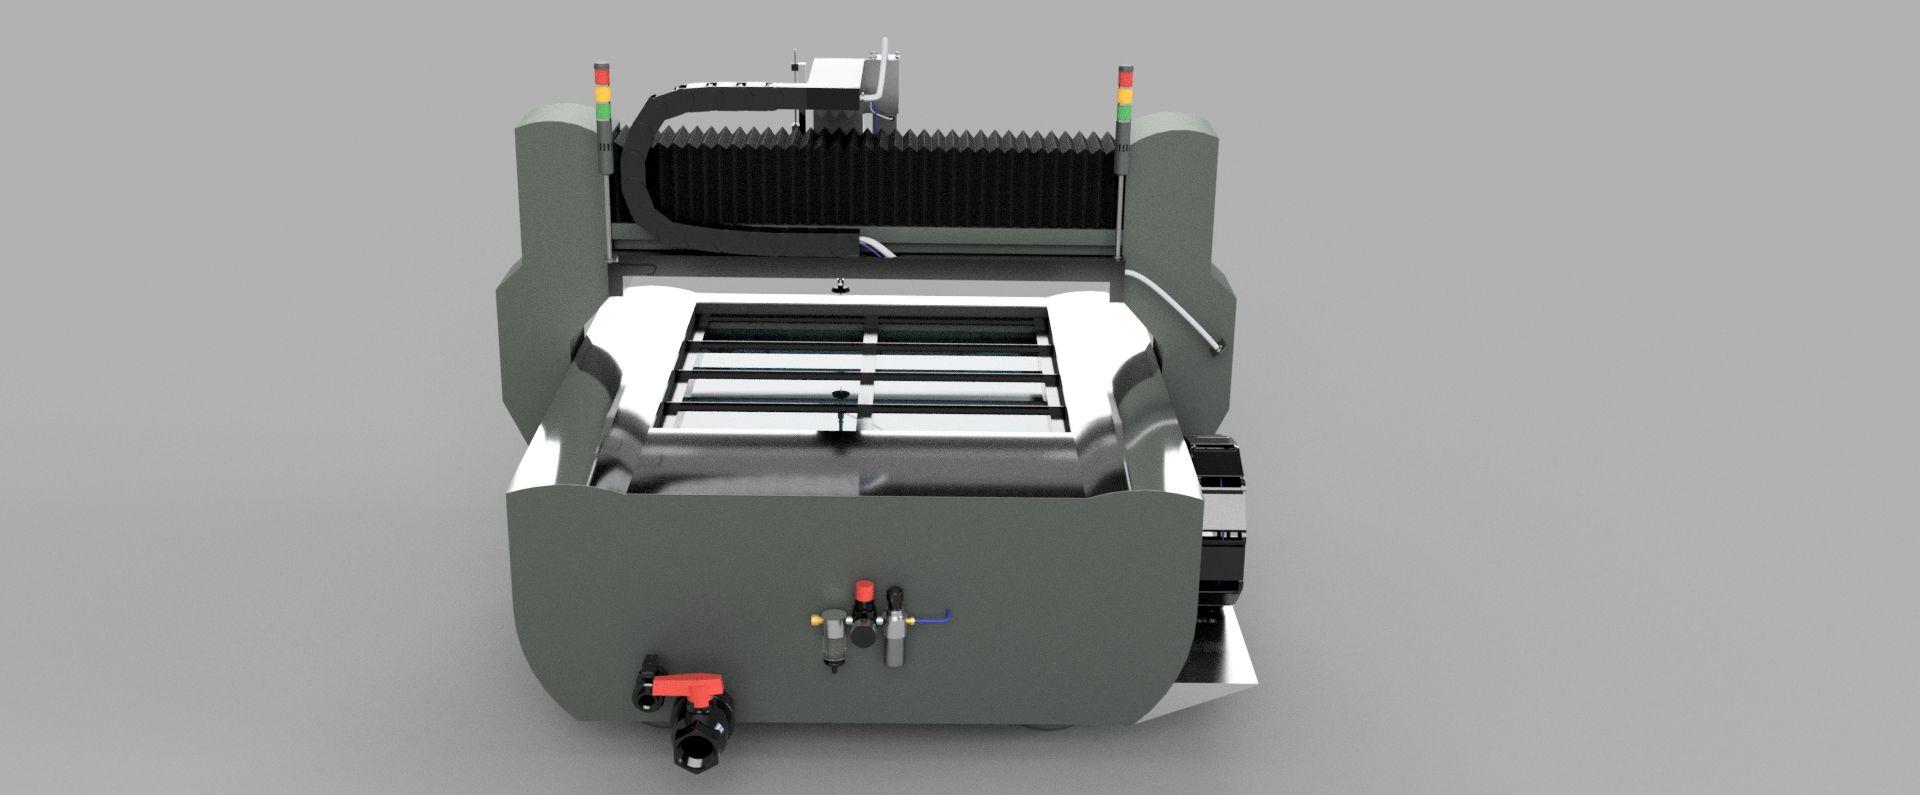 Main-tank-v153-3500-3500